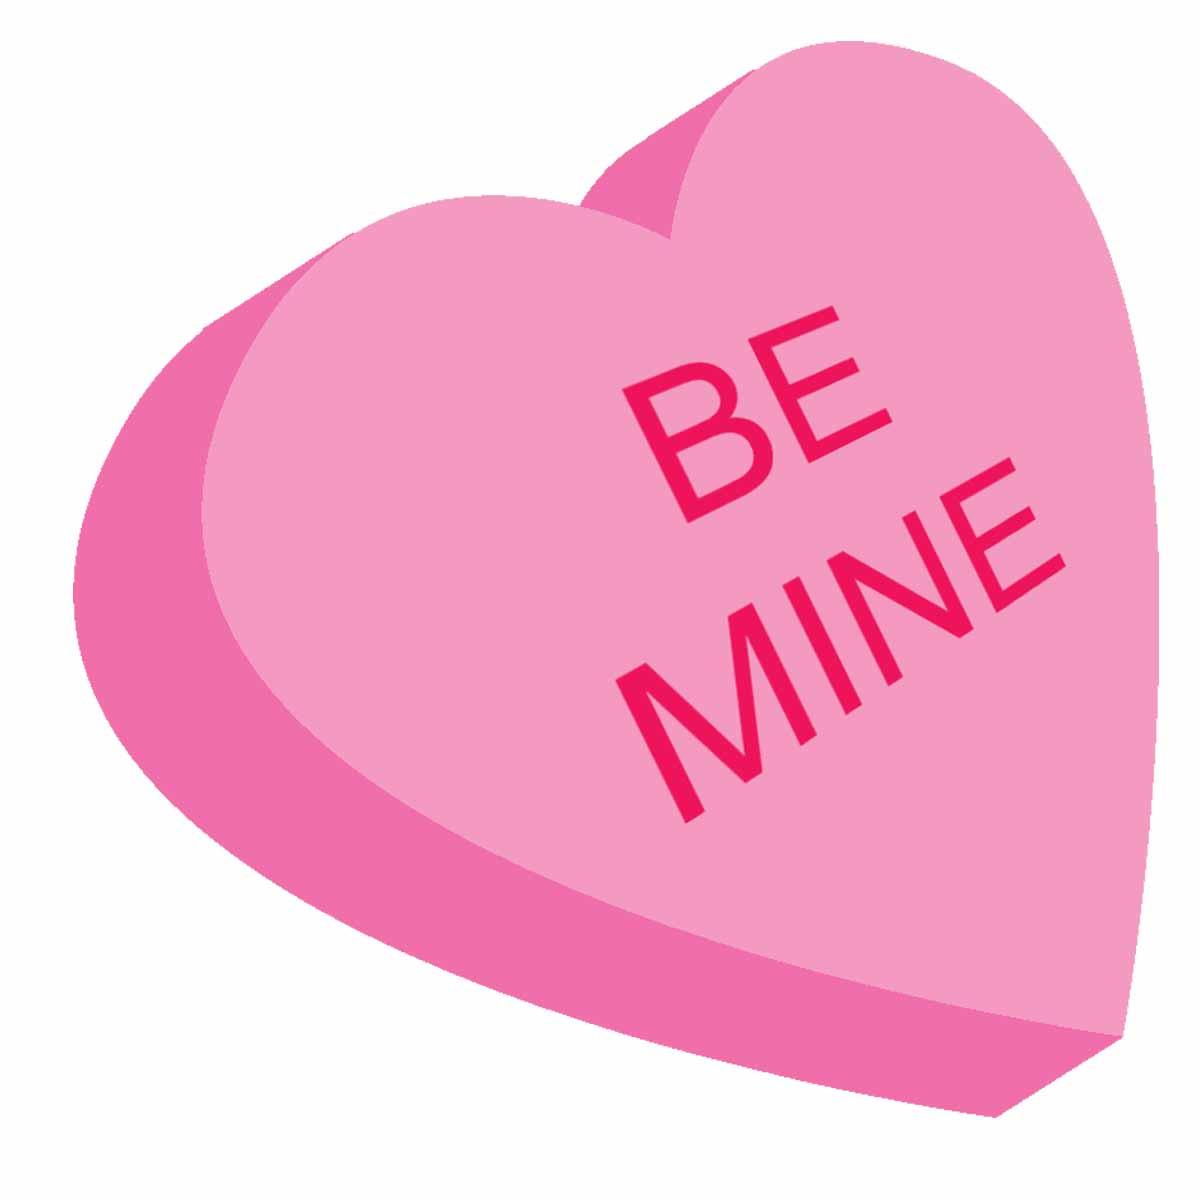 valentines day clip art #3 - Valentines Day Clipart